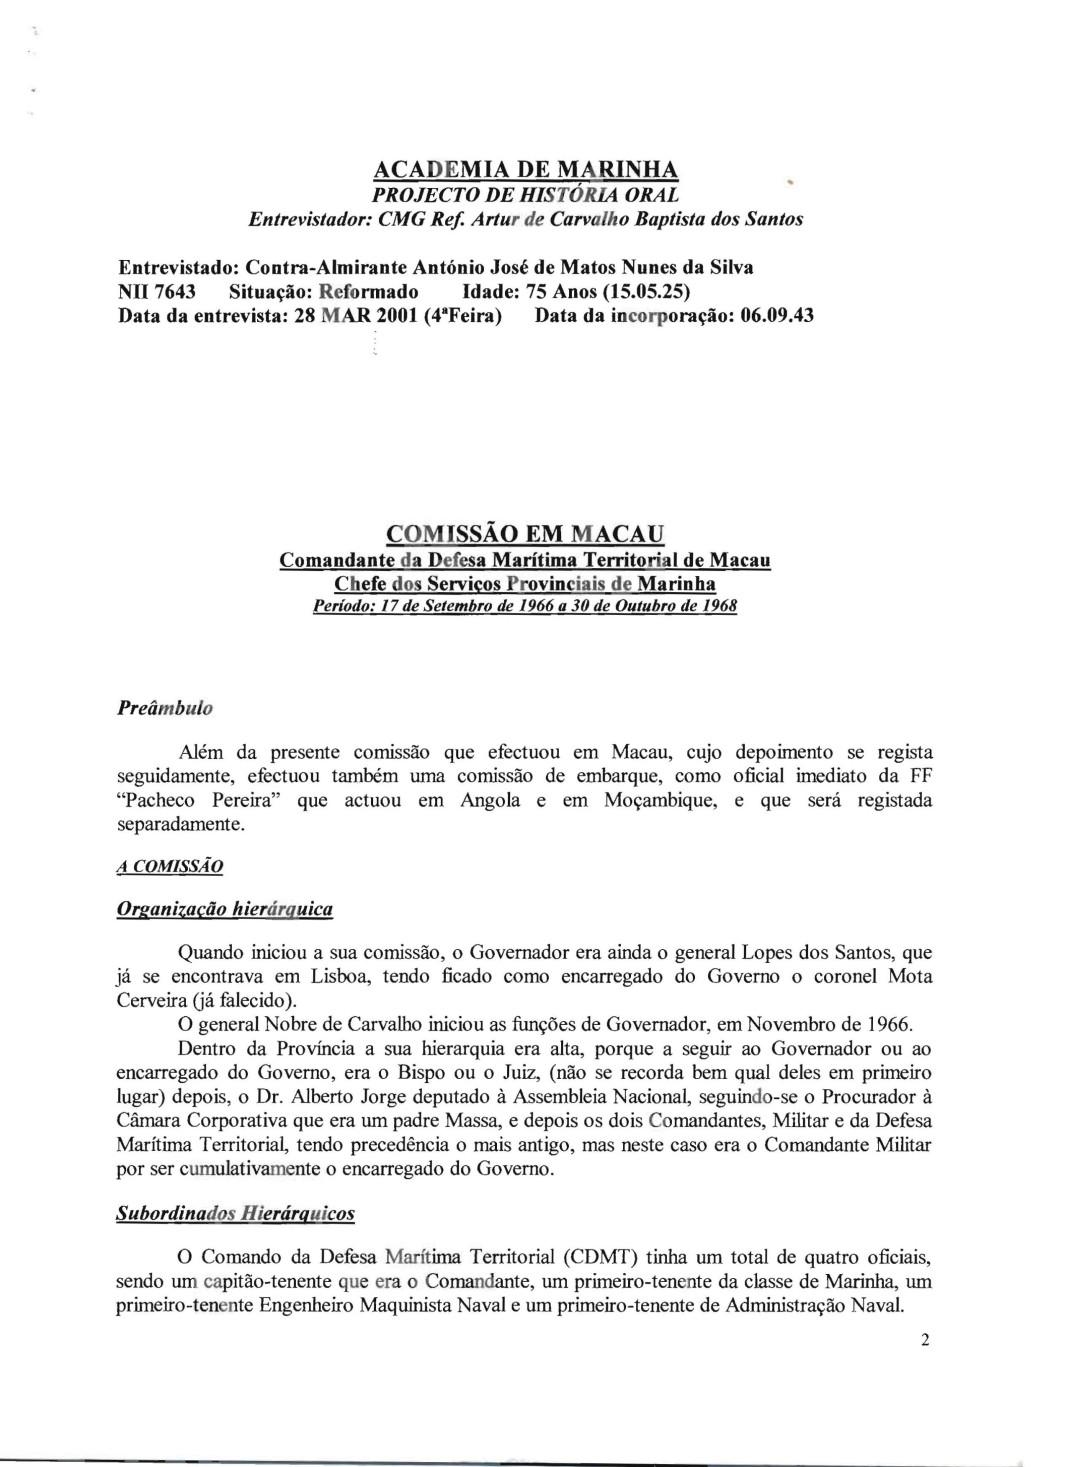 00467 01-03-28 Academia de Marinha-Entrevista do Alm Nunes da Silva pg 2 de 12